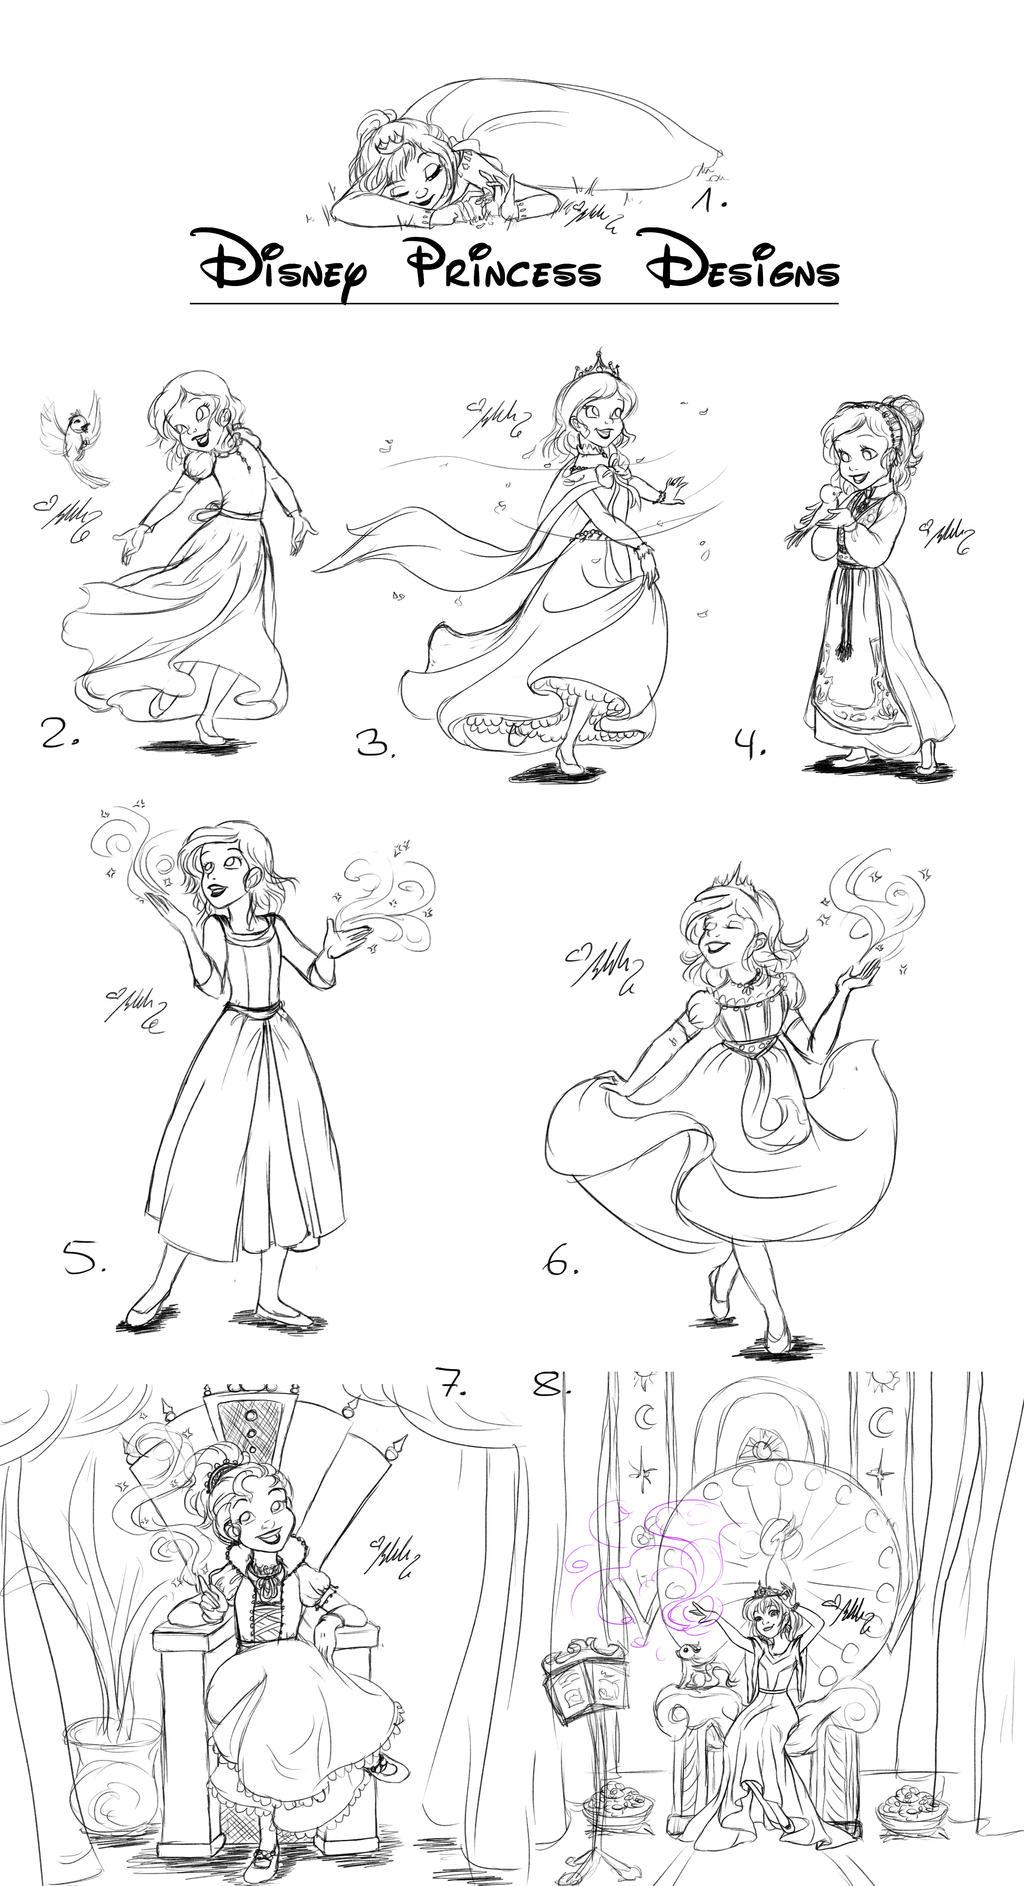 Disney Princess Designs by YummingDoe4